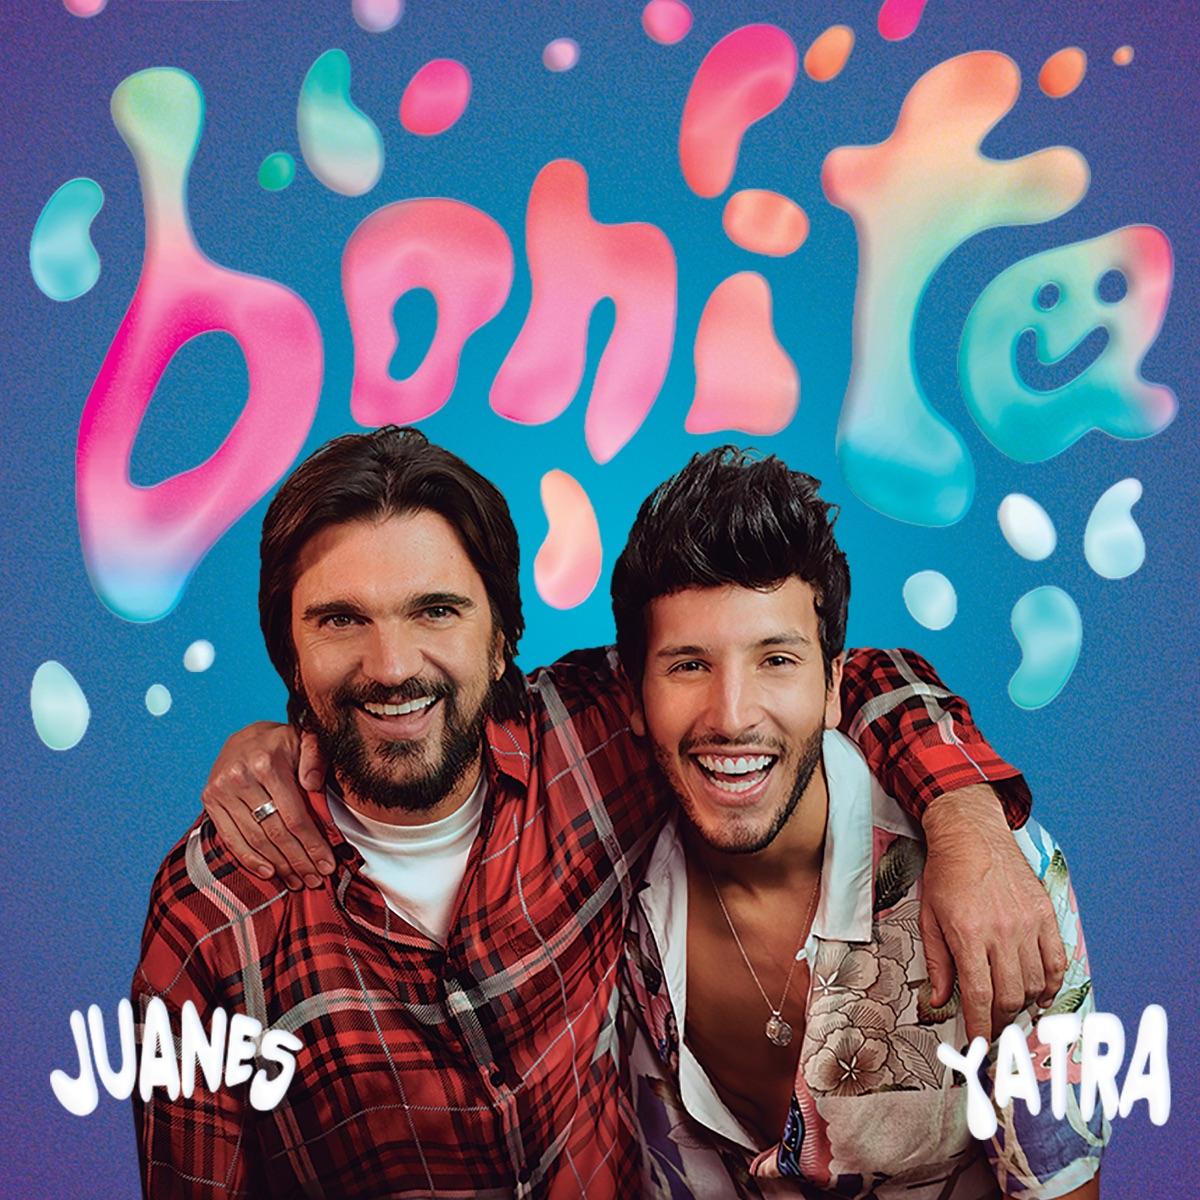 Juanes & Sebastian Yatra - Bonita